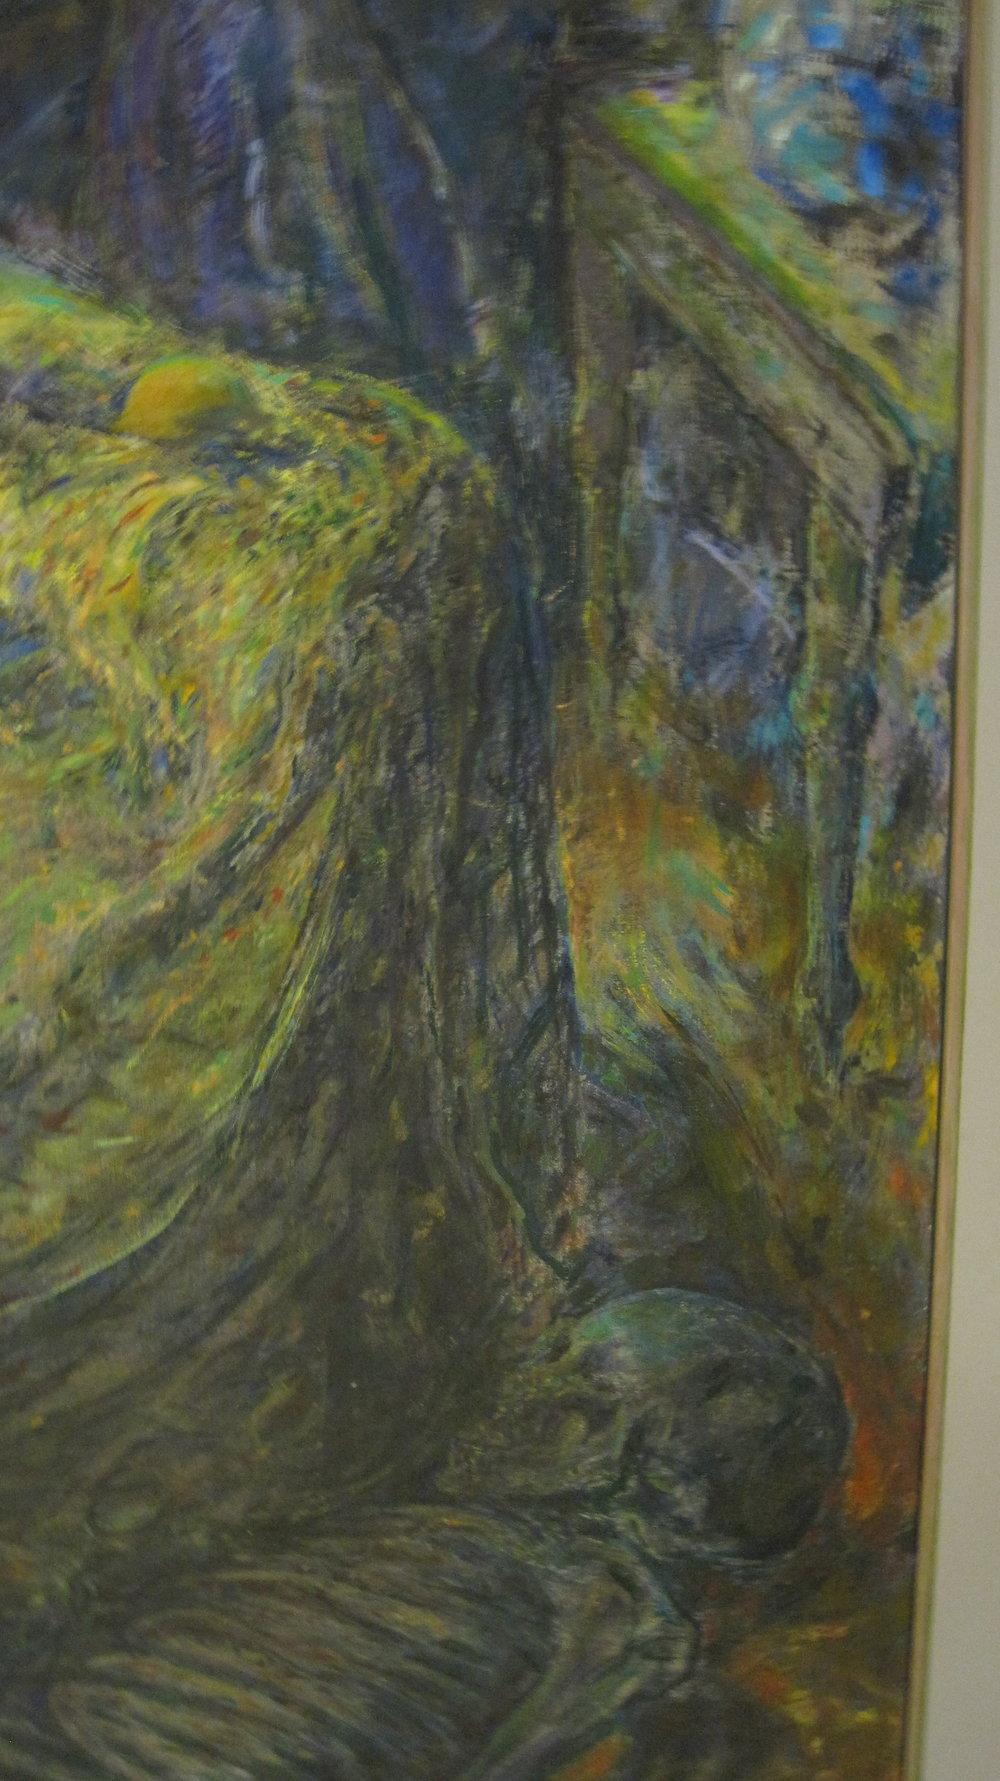 Sun Stroke (detail lower right), 1998-2000, synthetic resin on linen, 144 x 172 cm